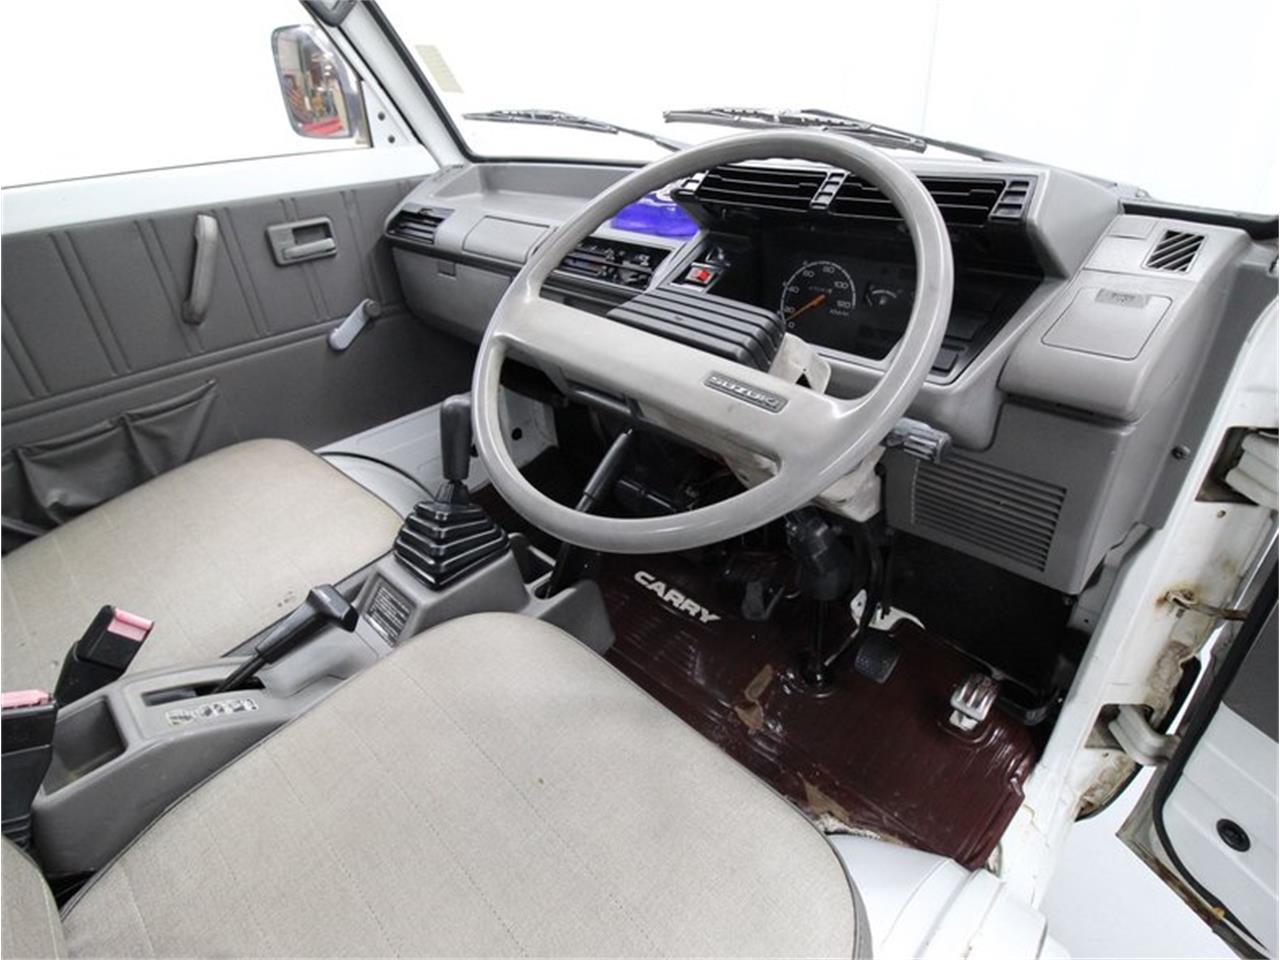 1990 Suzuki Carry (CC-1378500) for sale in Christiansburg, Virginia